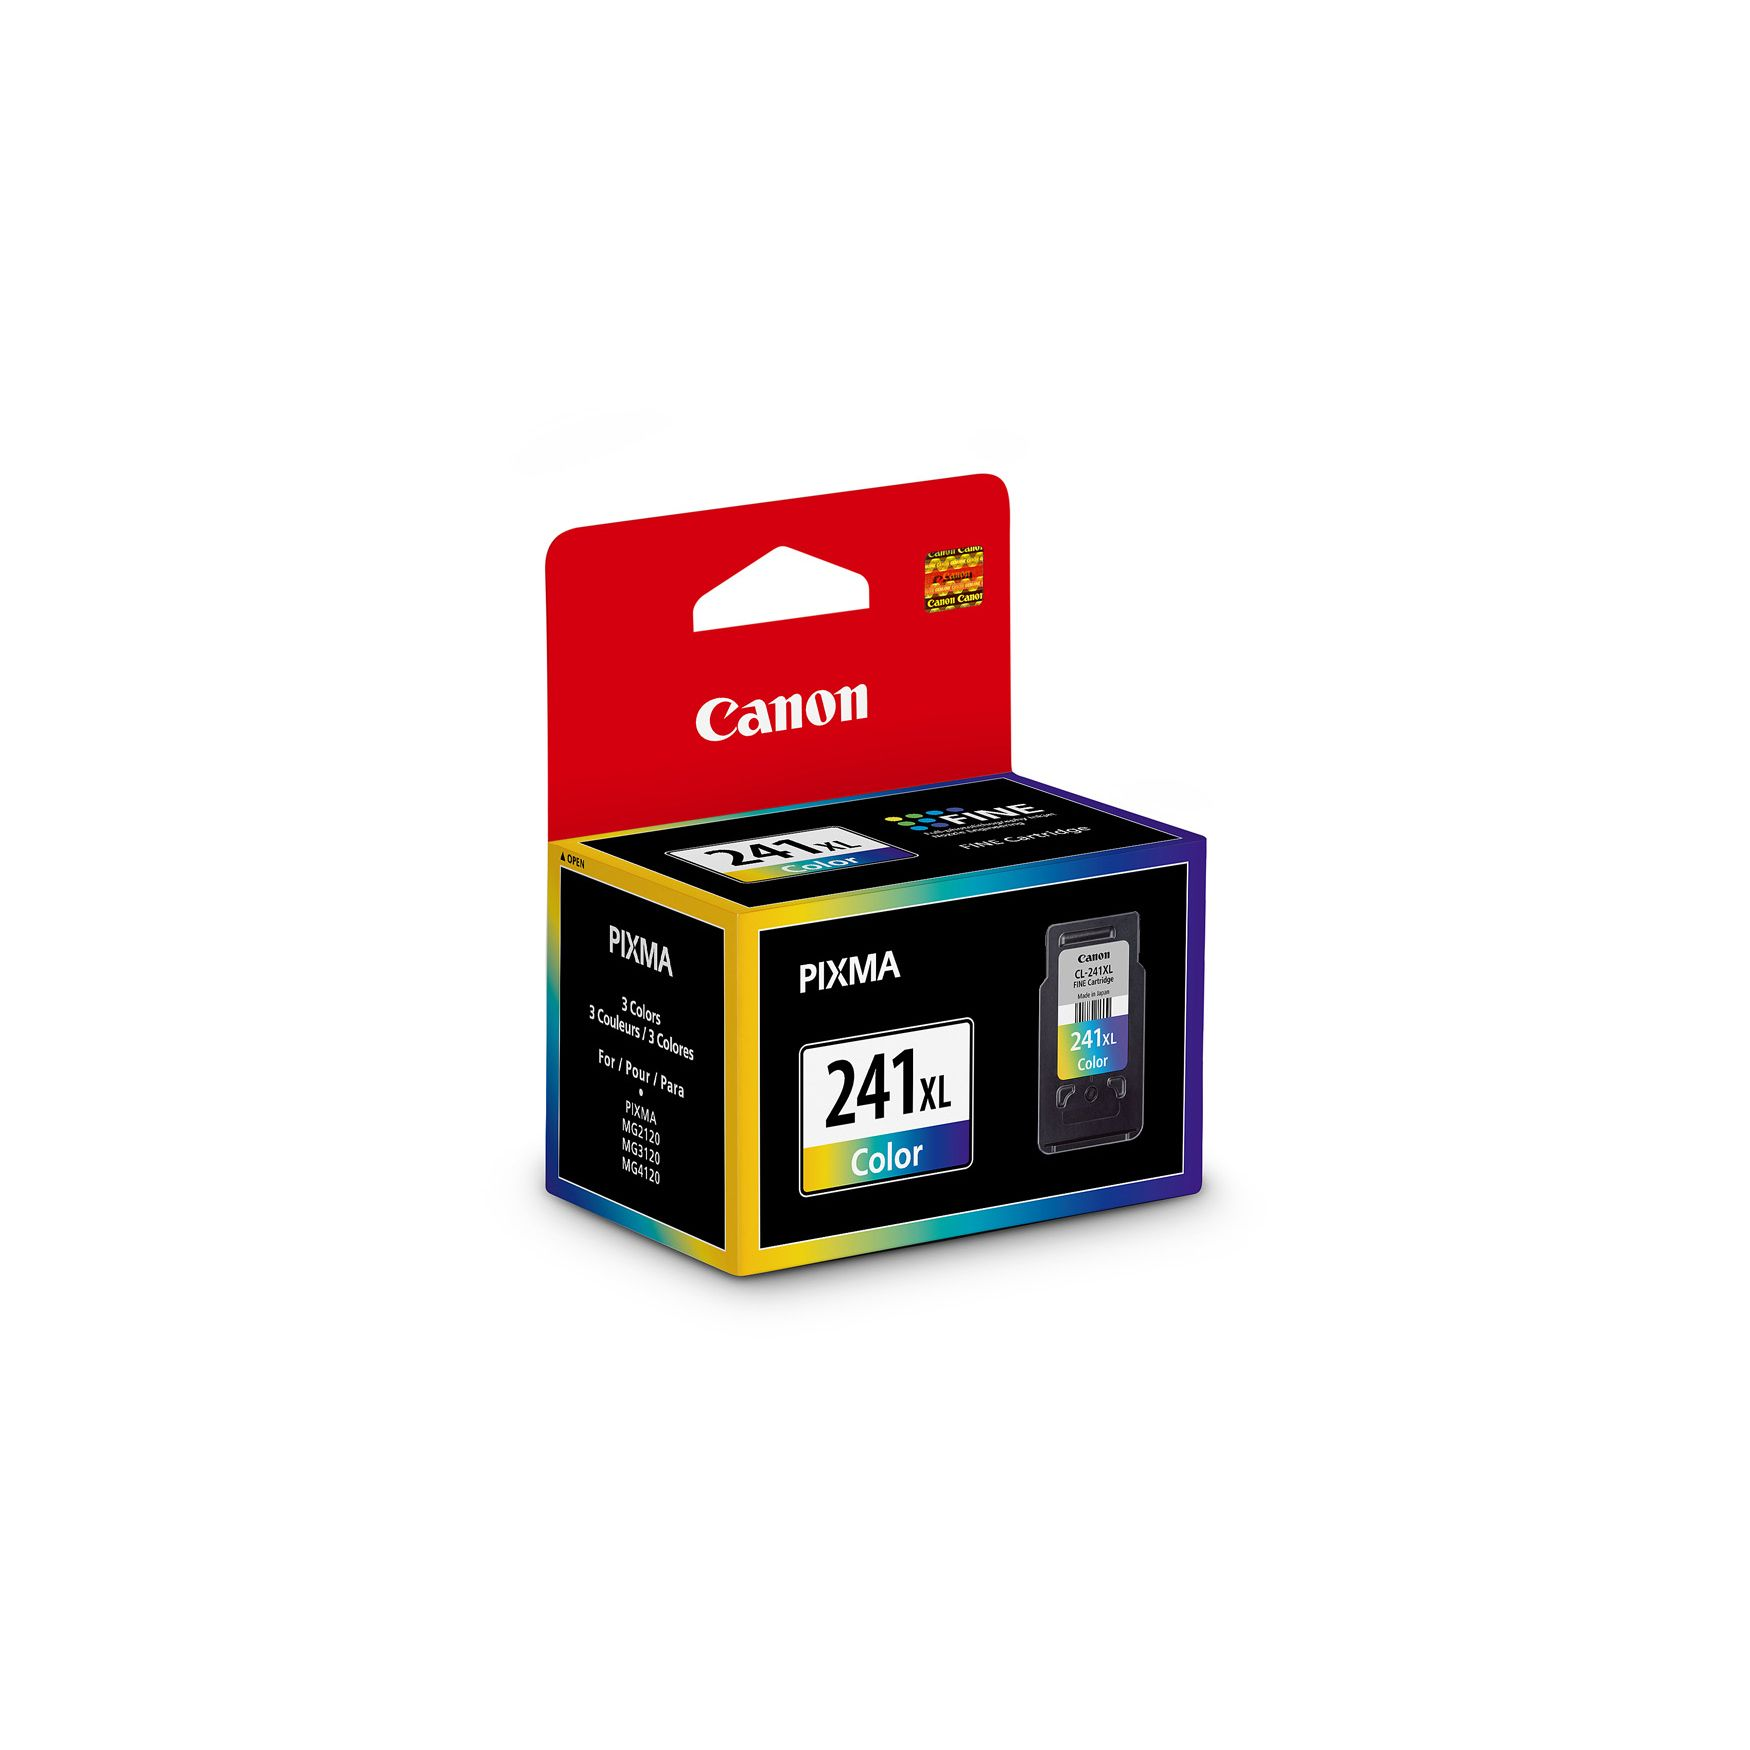 Canon CL-241XL FINE Ink Color Cartridge